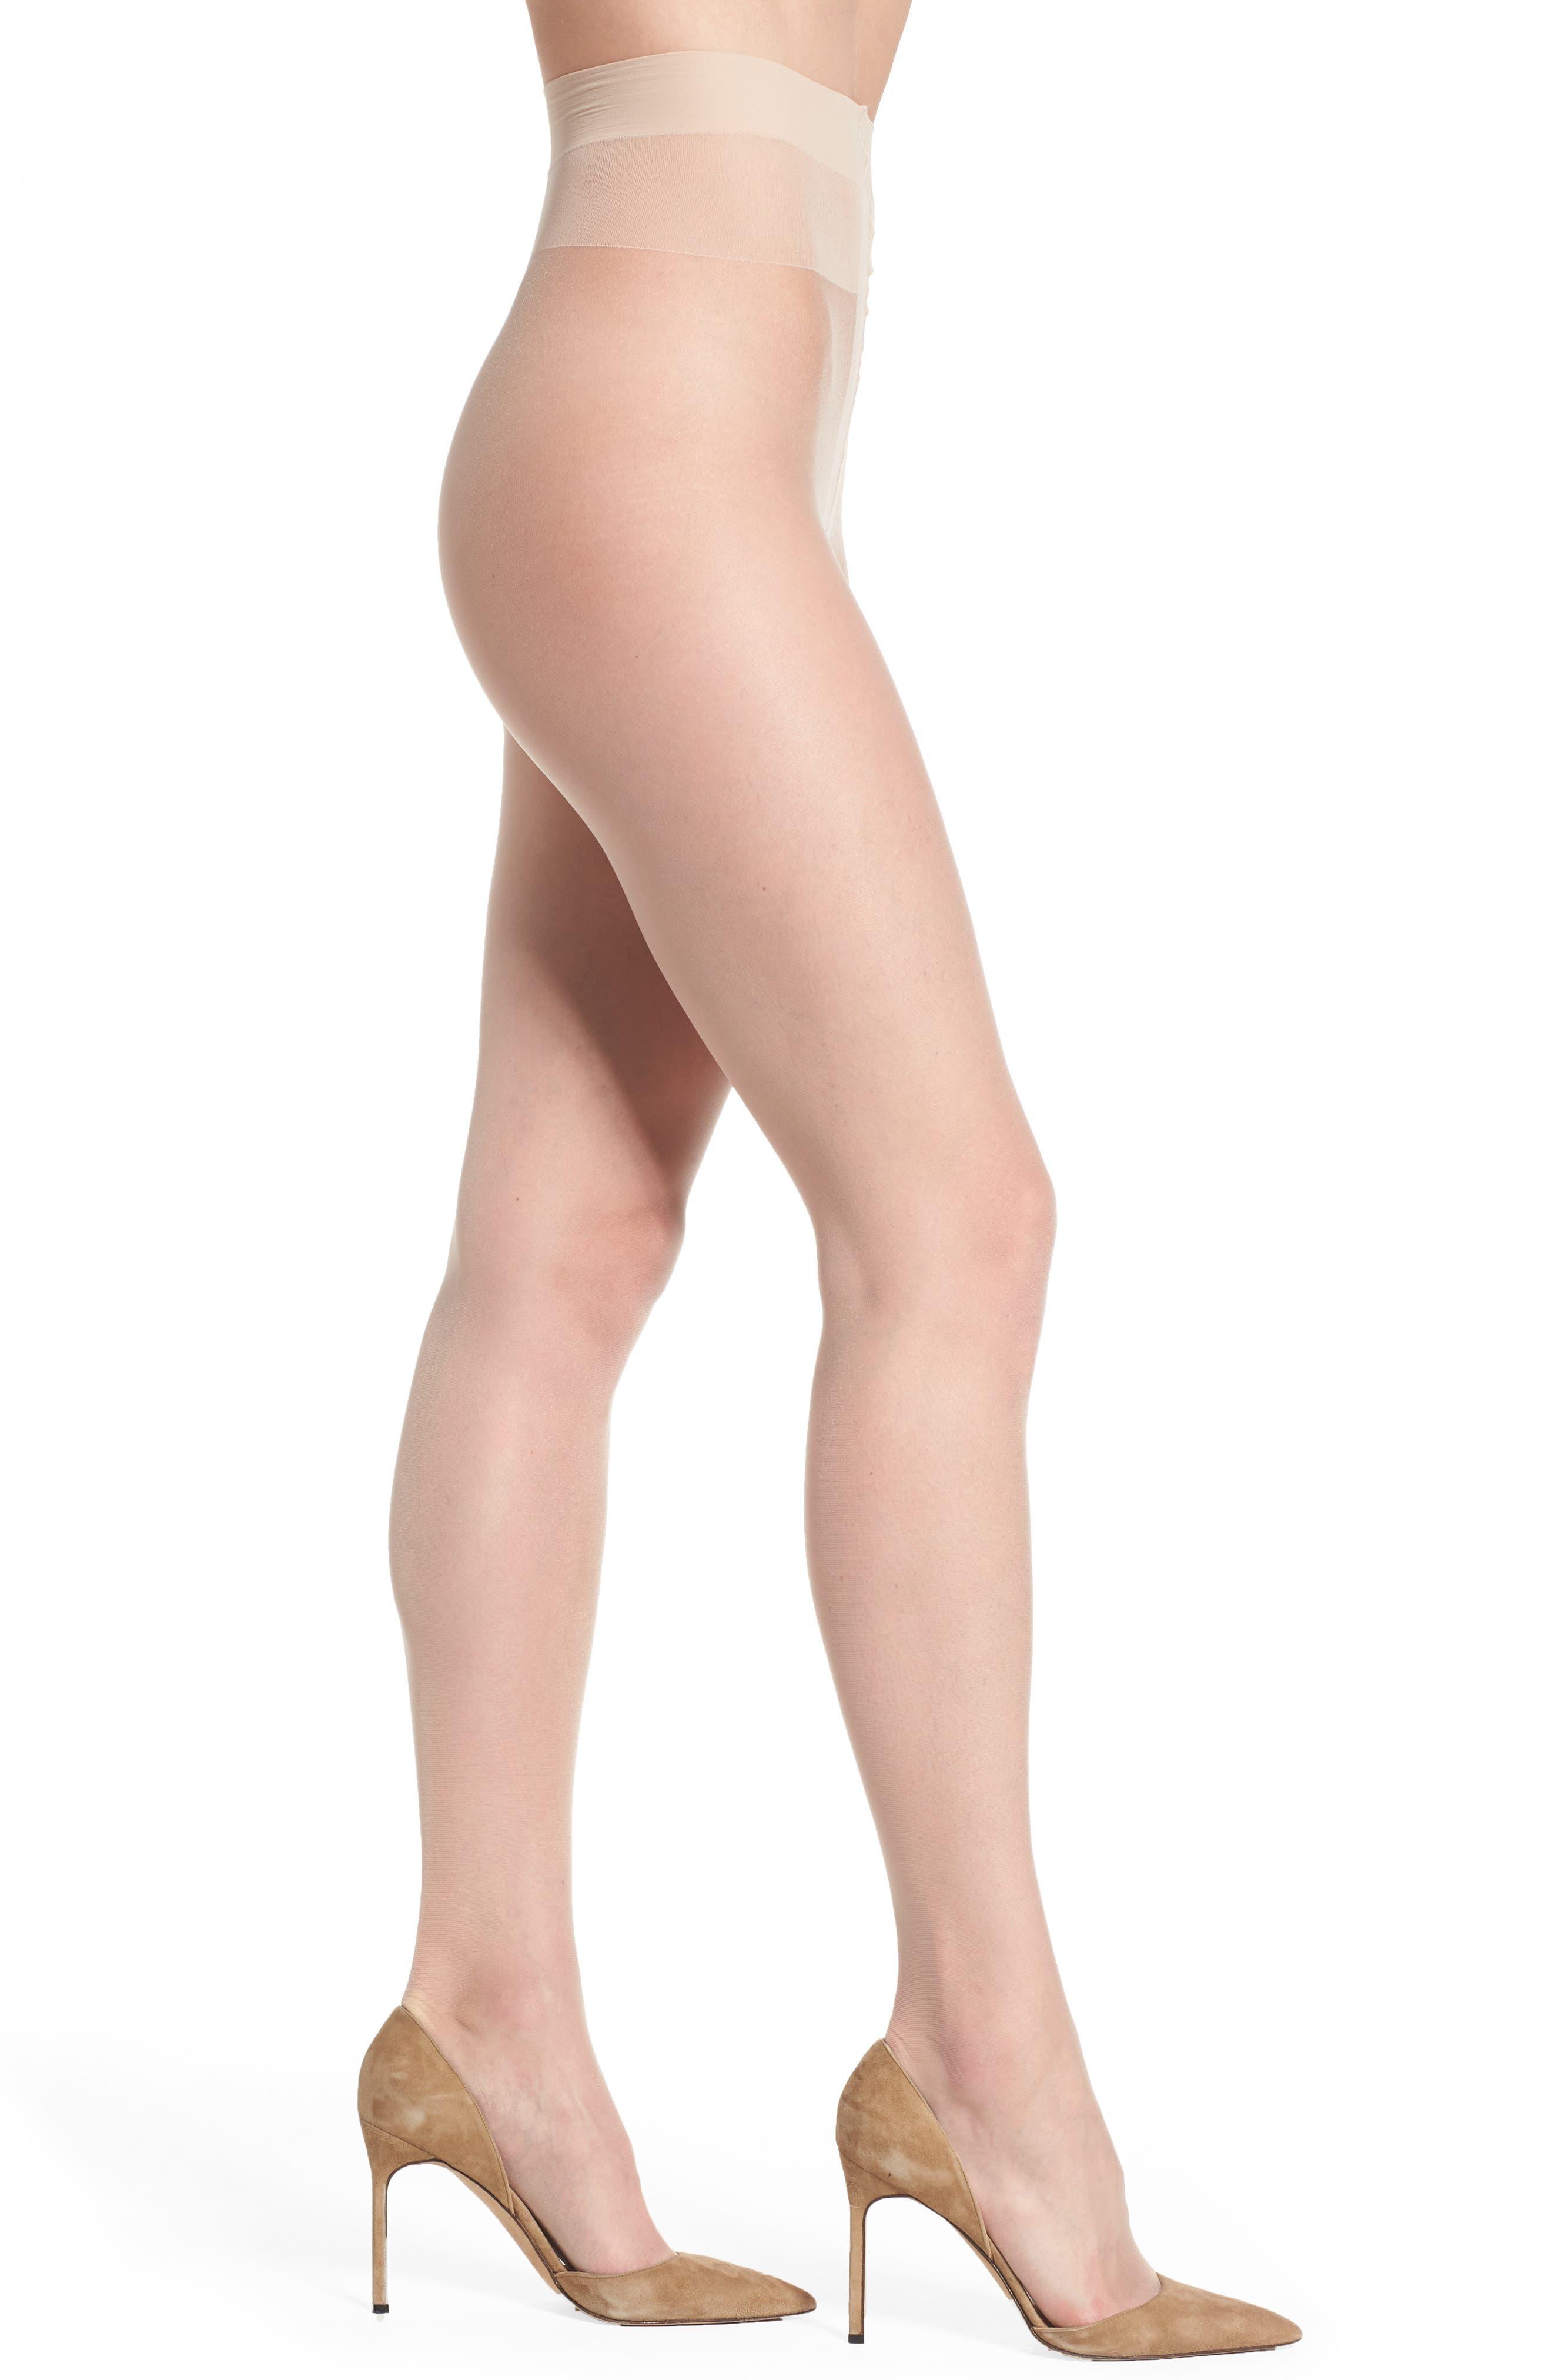 Main Image - Donna Karan 'The Nudes' Sheer to Waist Hosiery